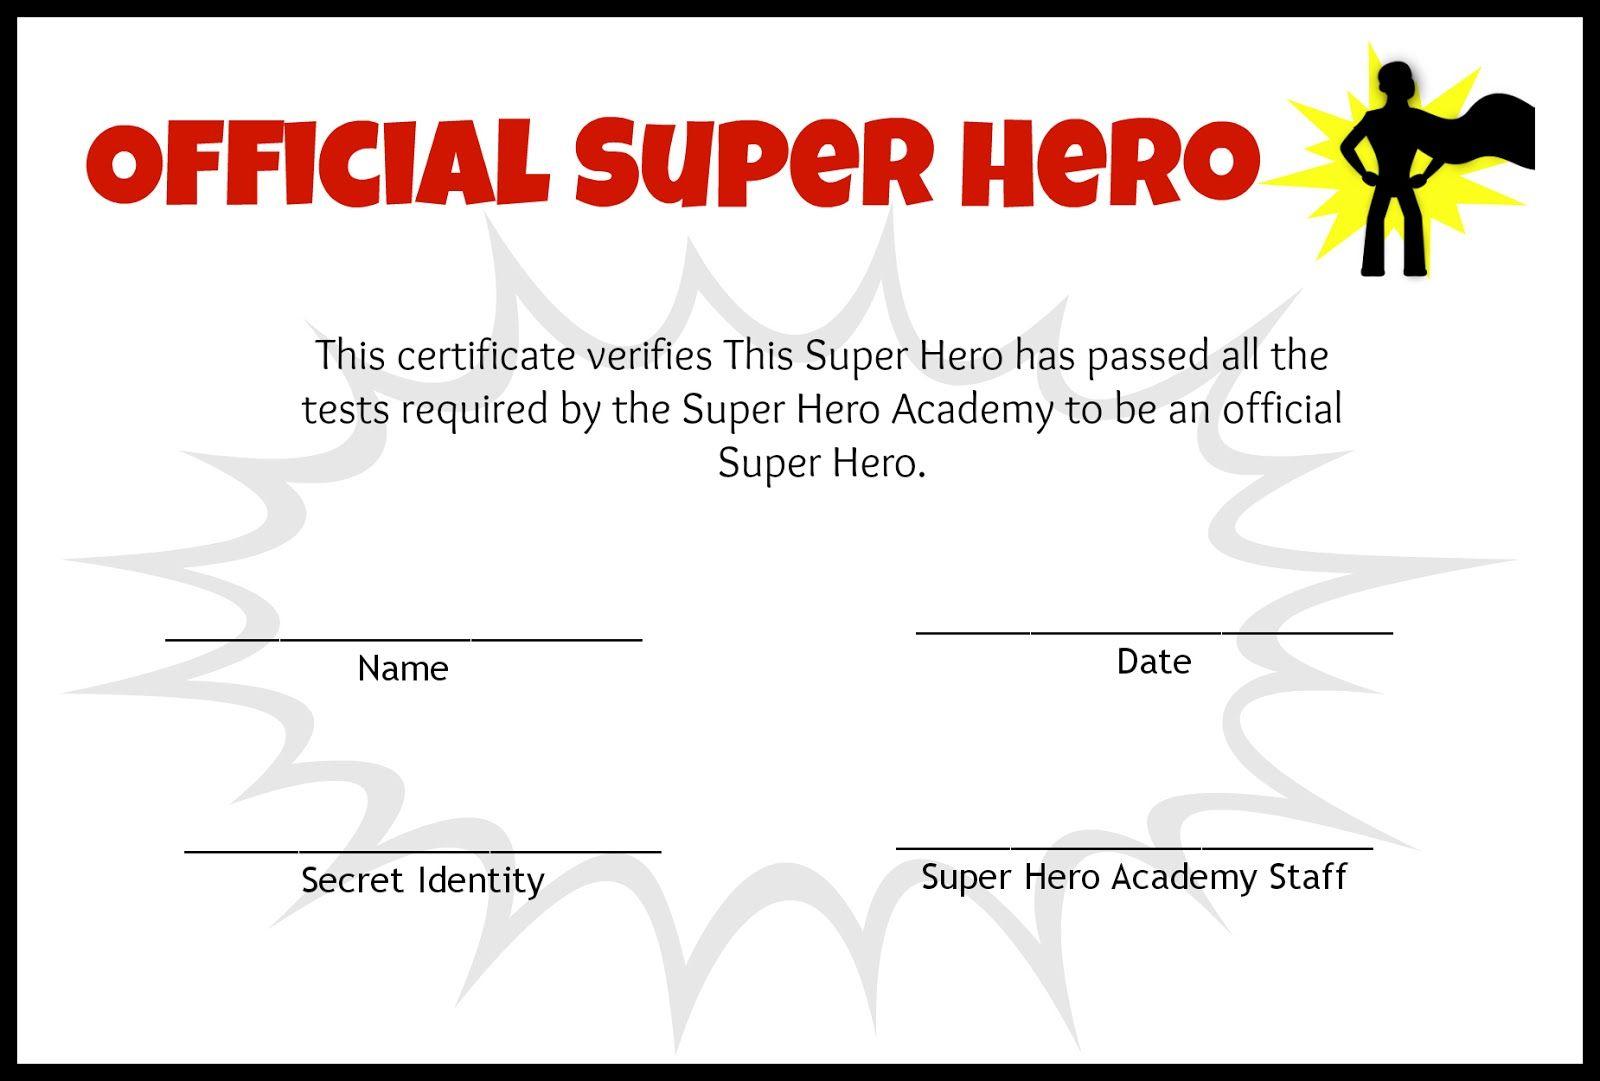 Pinian Hudson On Art In 2019 | Pinterest | Super Hero Day, Super - Free Printable Superhero Certificates